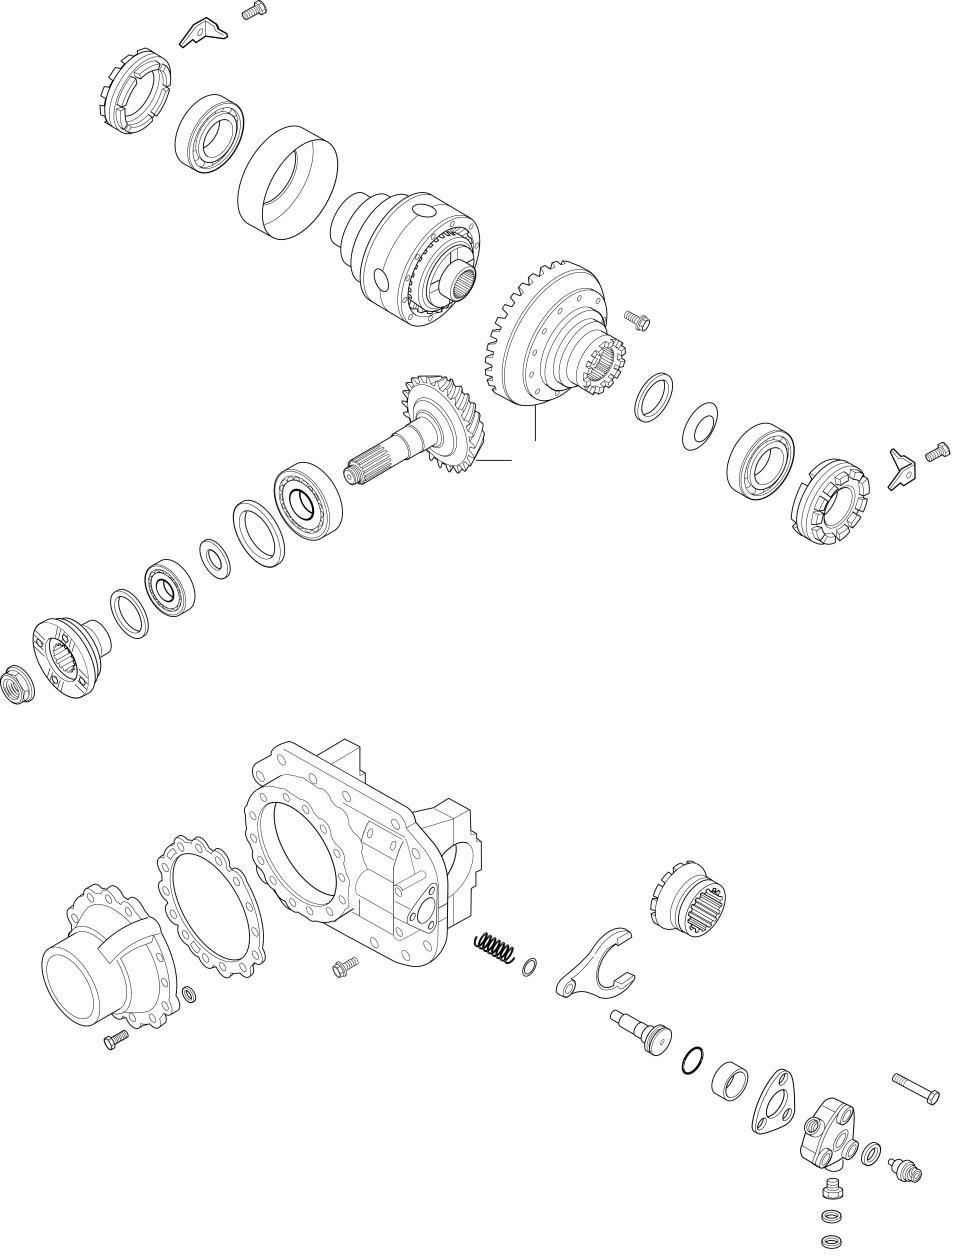 HL 7/55 DCS-13 (ACTROS)